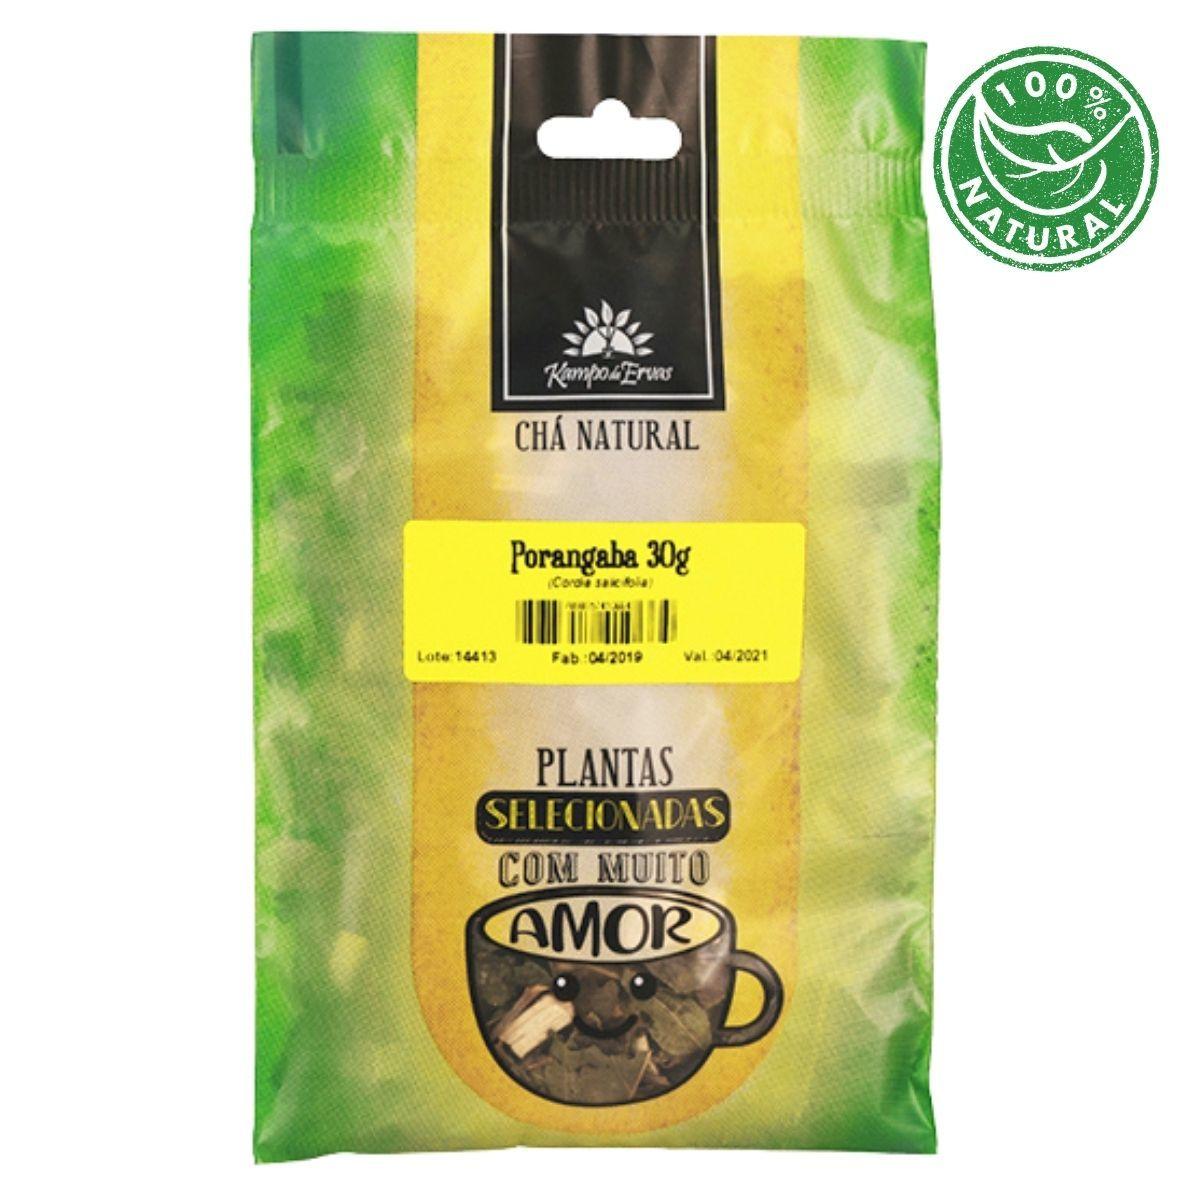 Porangaba Chá de Bugre Folhas Kampo de Ervas 30 gramas